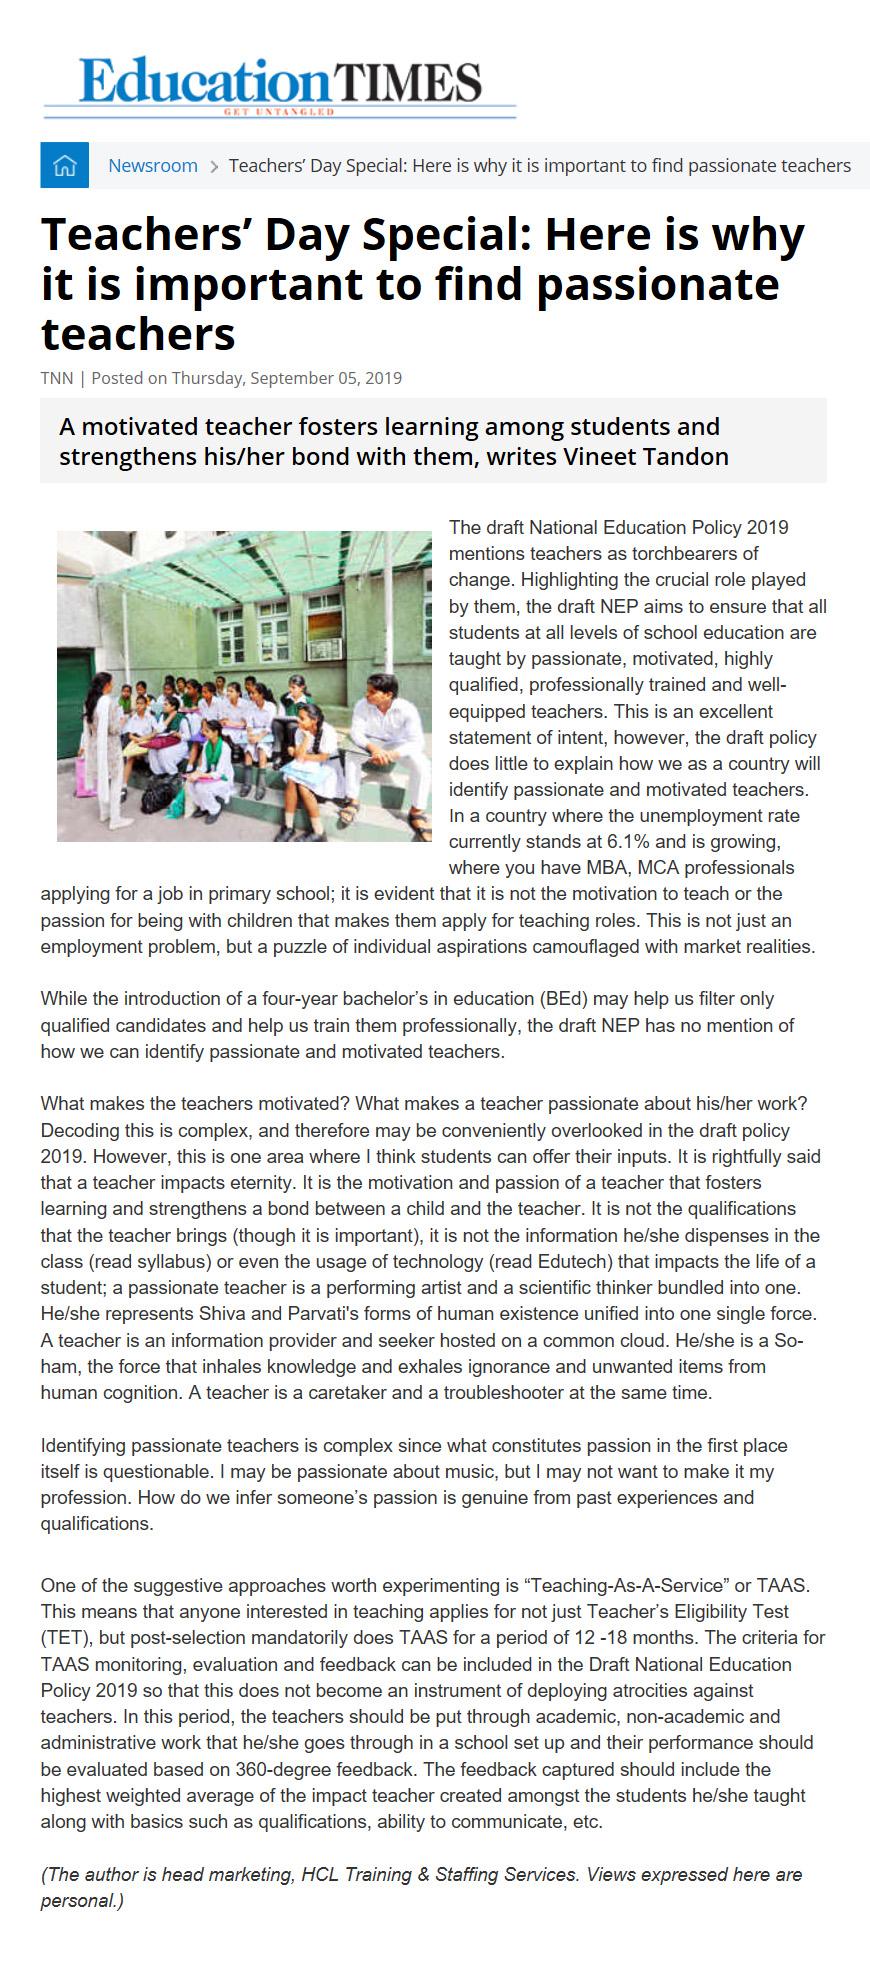 Education Times Online Version Sept 5, 2